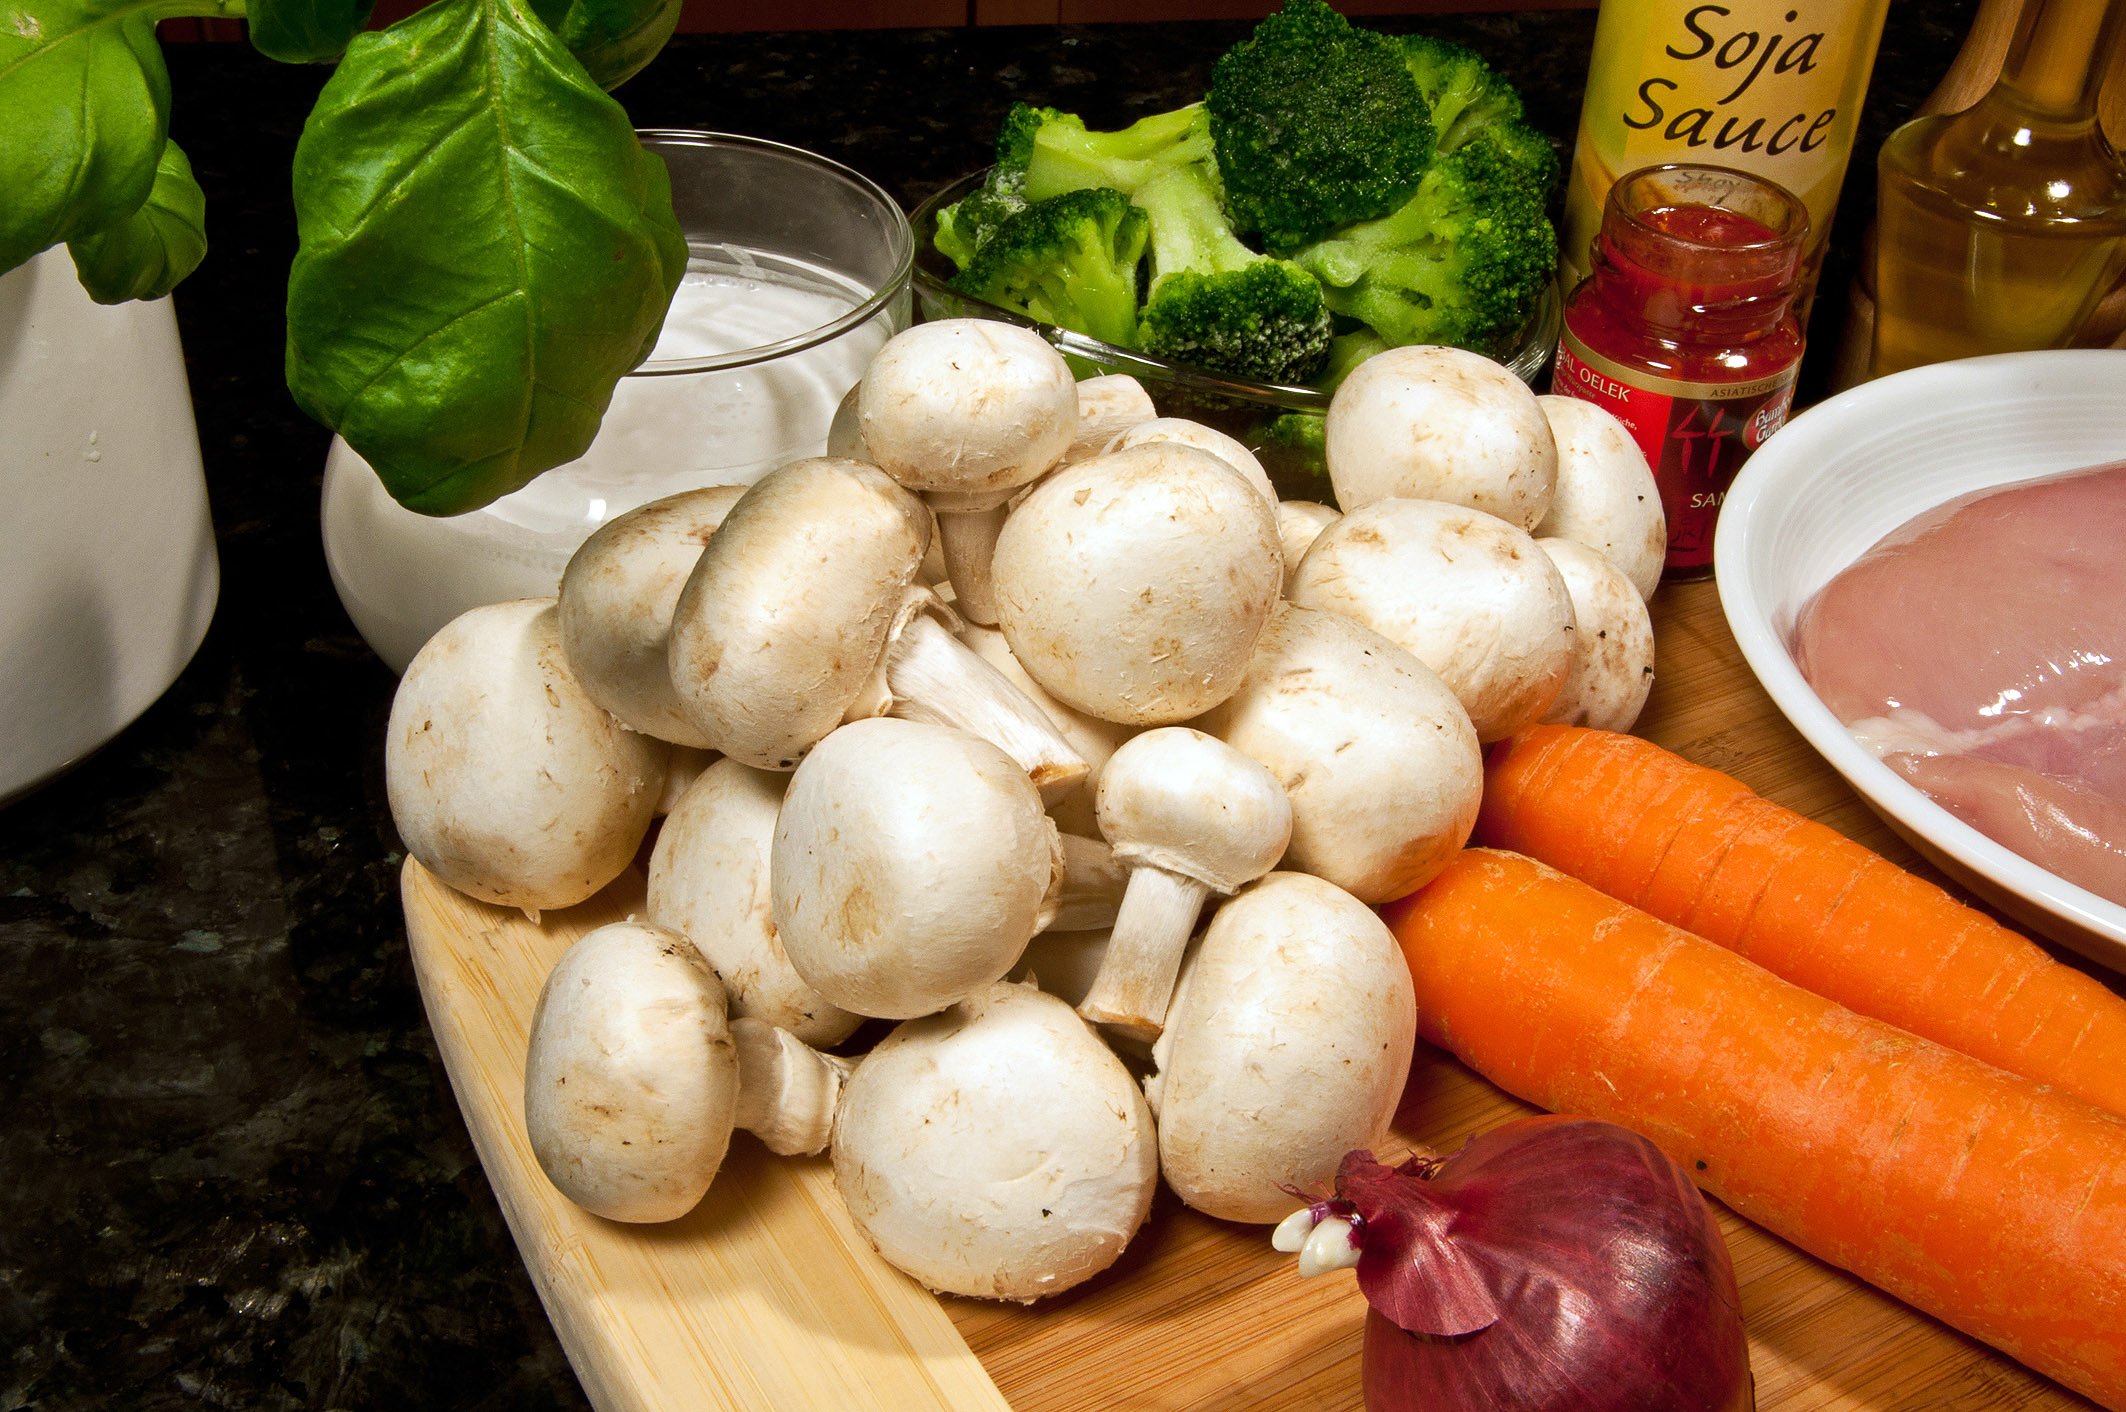 Mit Pilzen Prostatakrebs vorbeugen